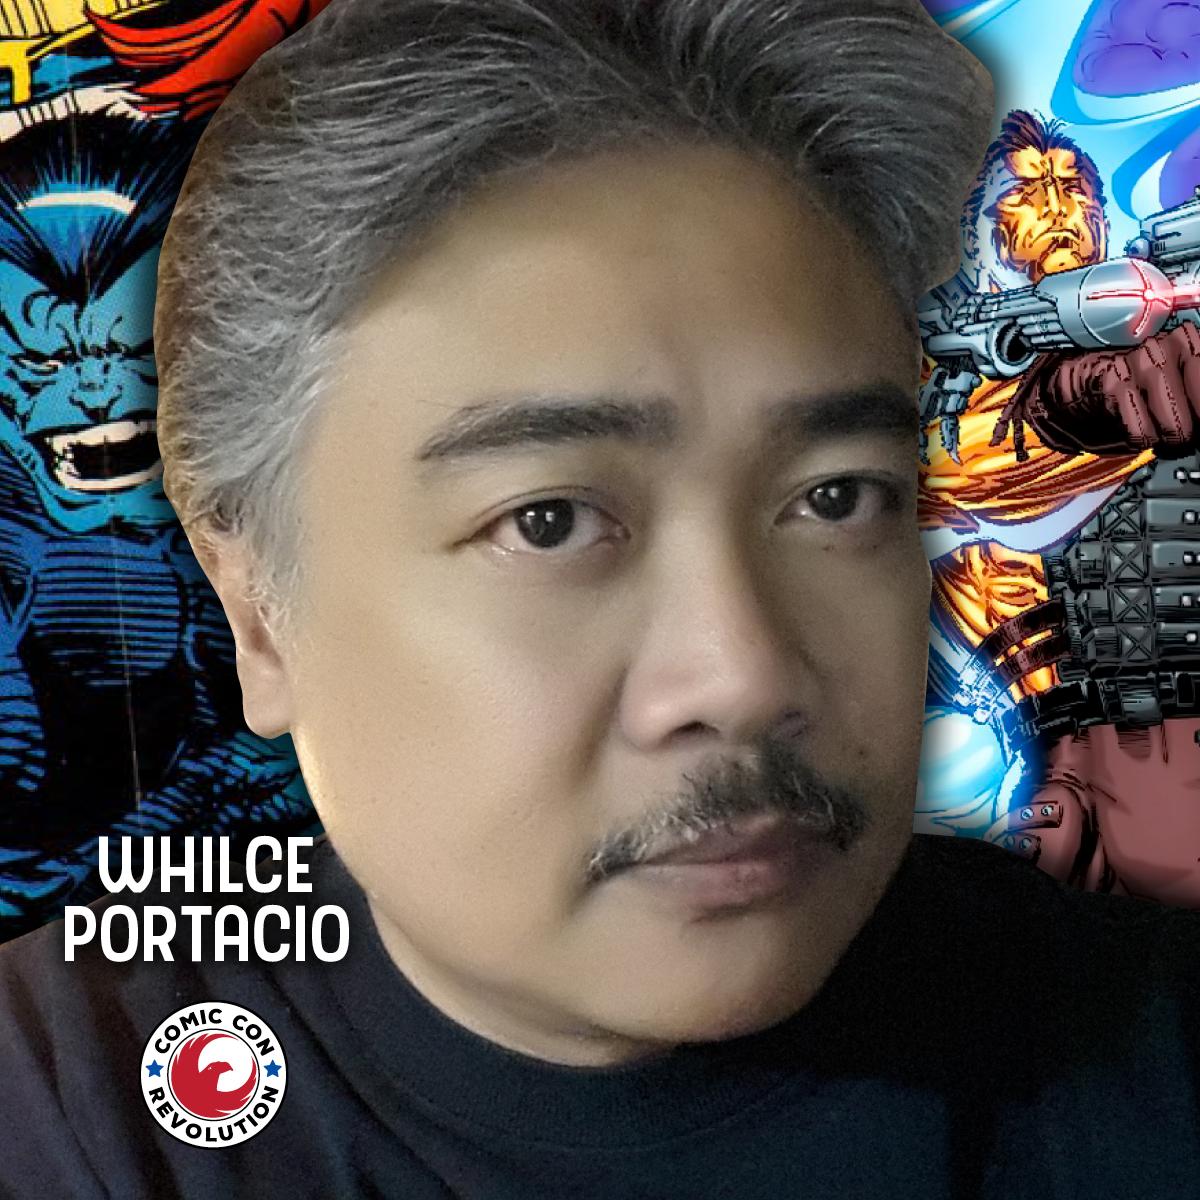 WHILCE PORTACIO - Comic Artist Legend; Wetworks, Uncanny X-Men, X-Factor, Punisher